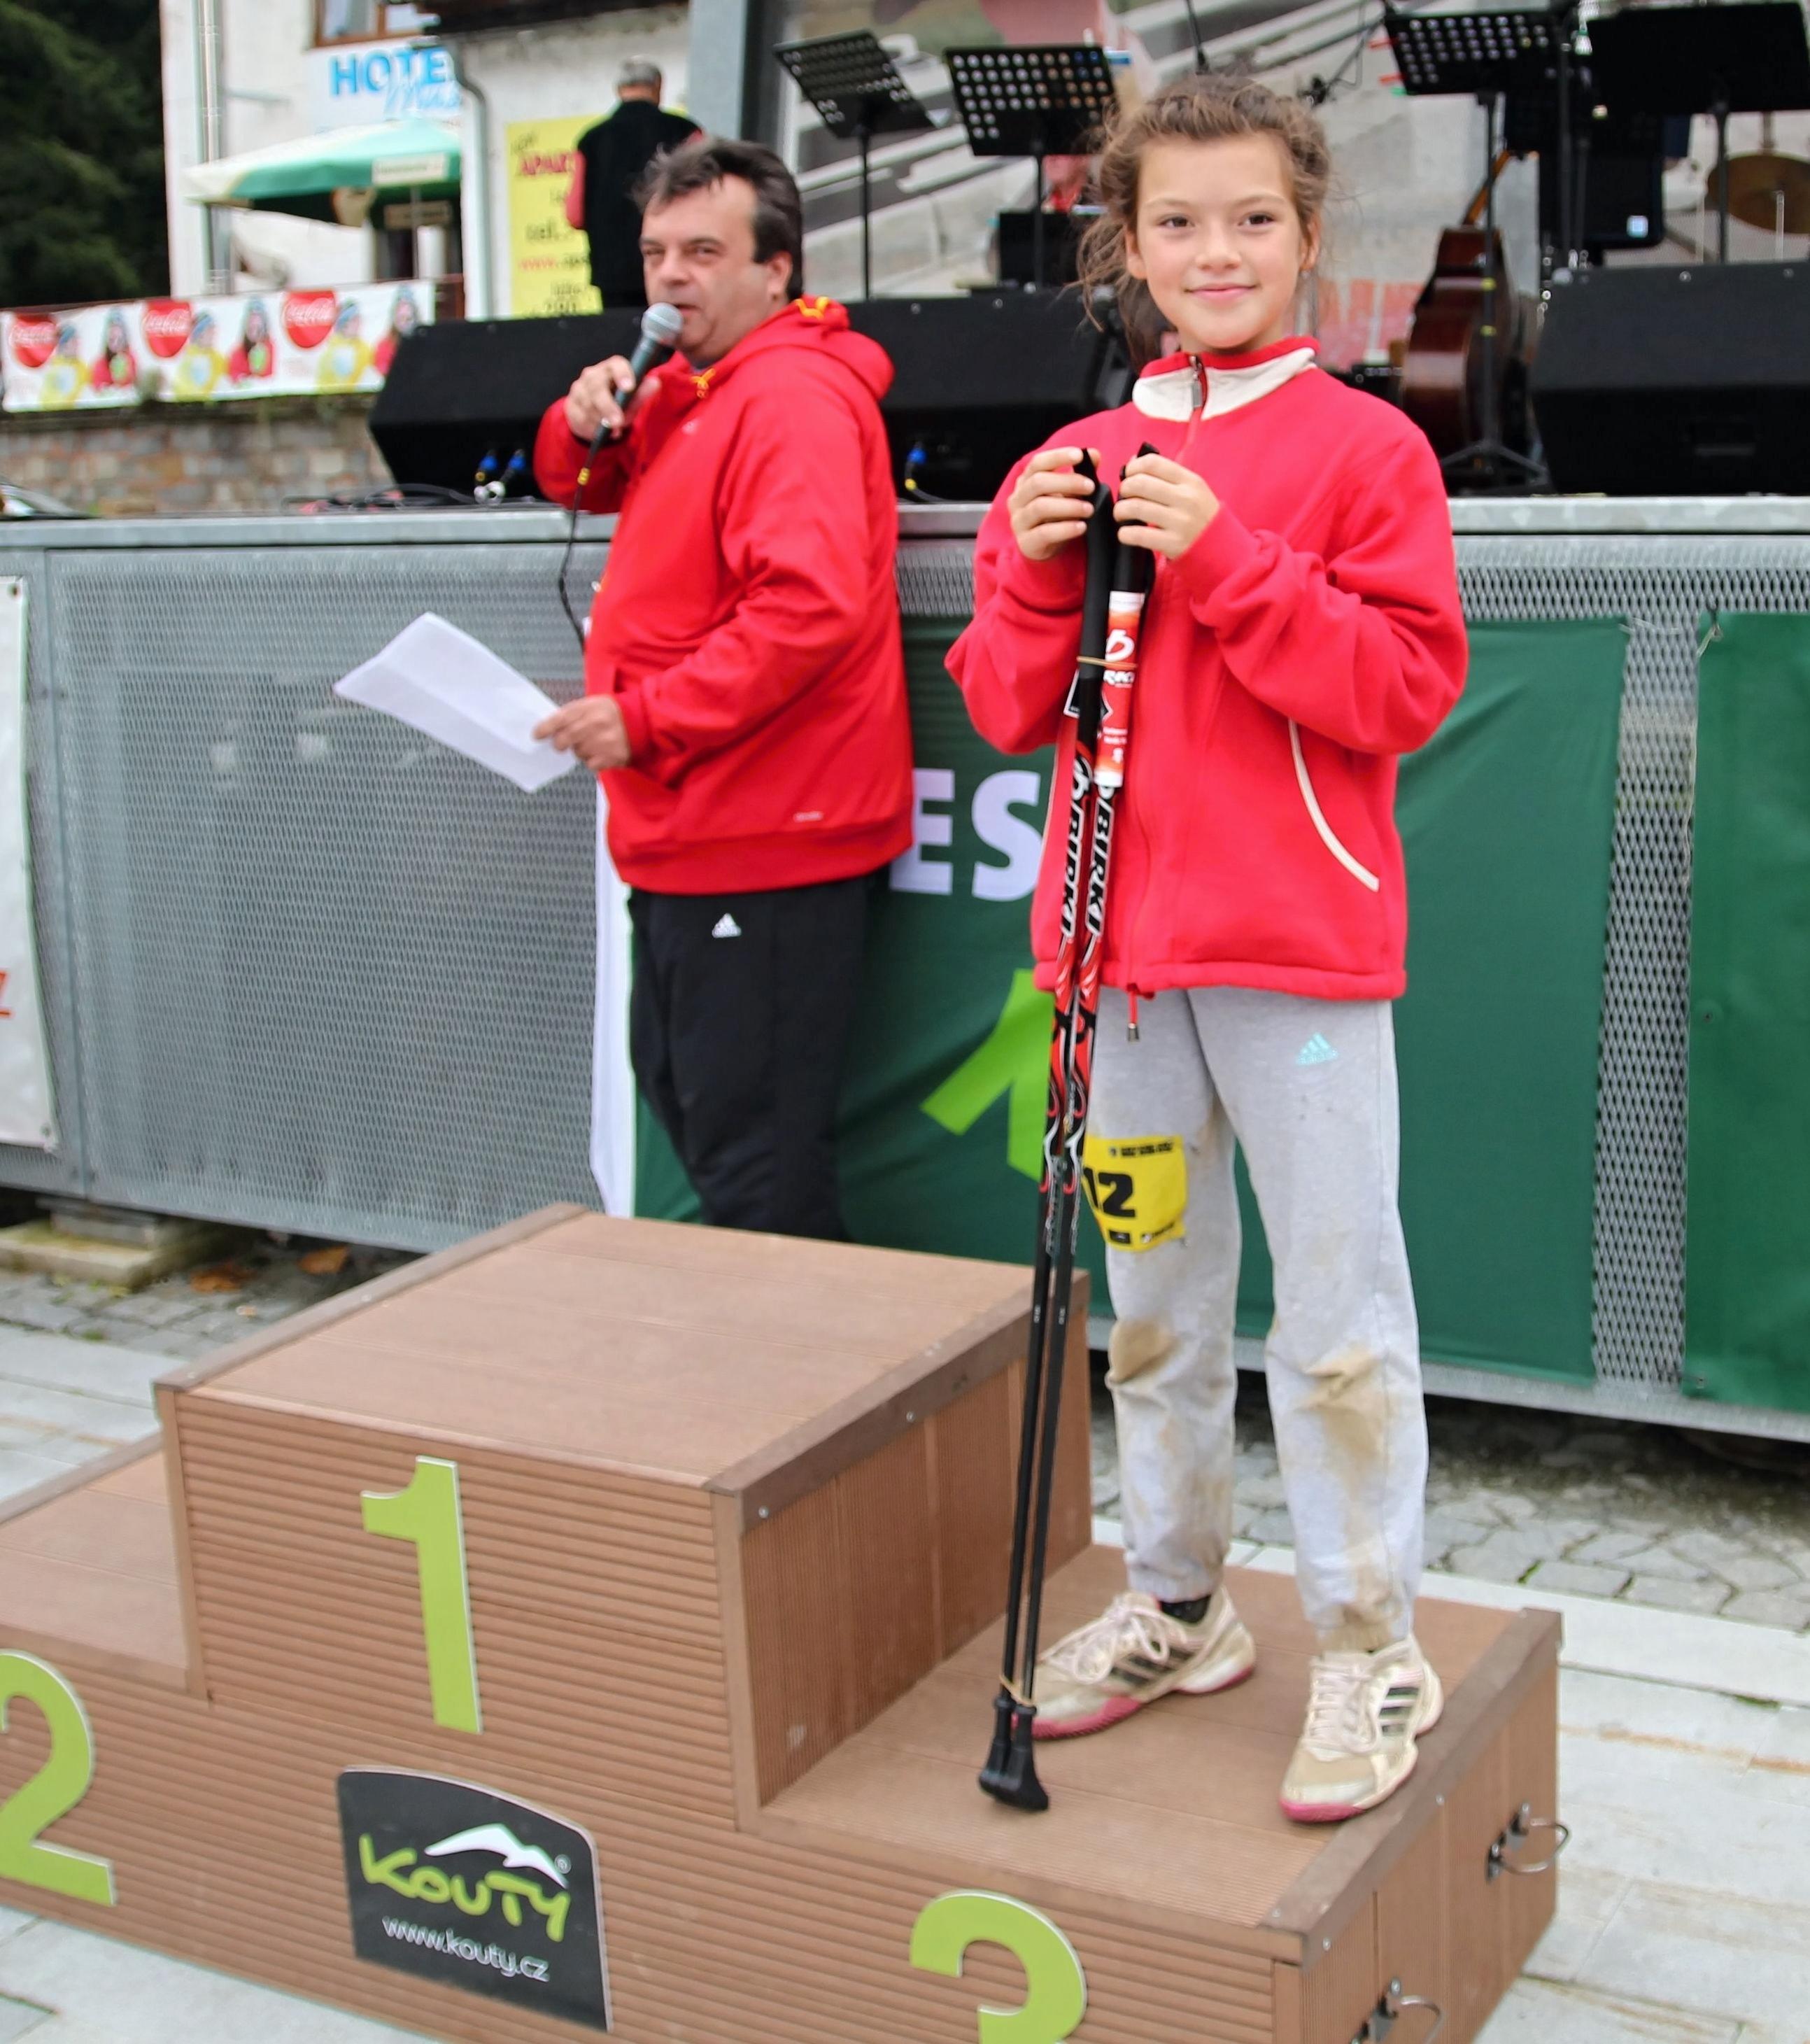 Olomoucko-opolské hry 2014